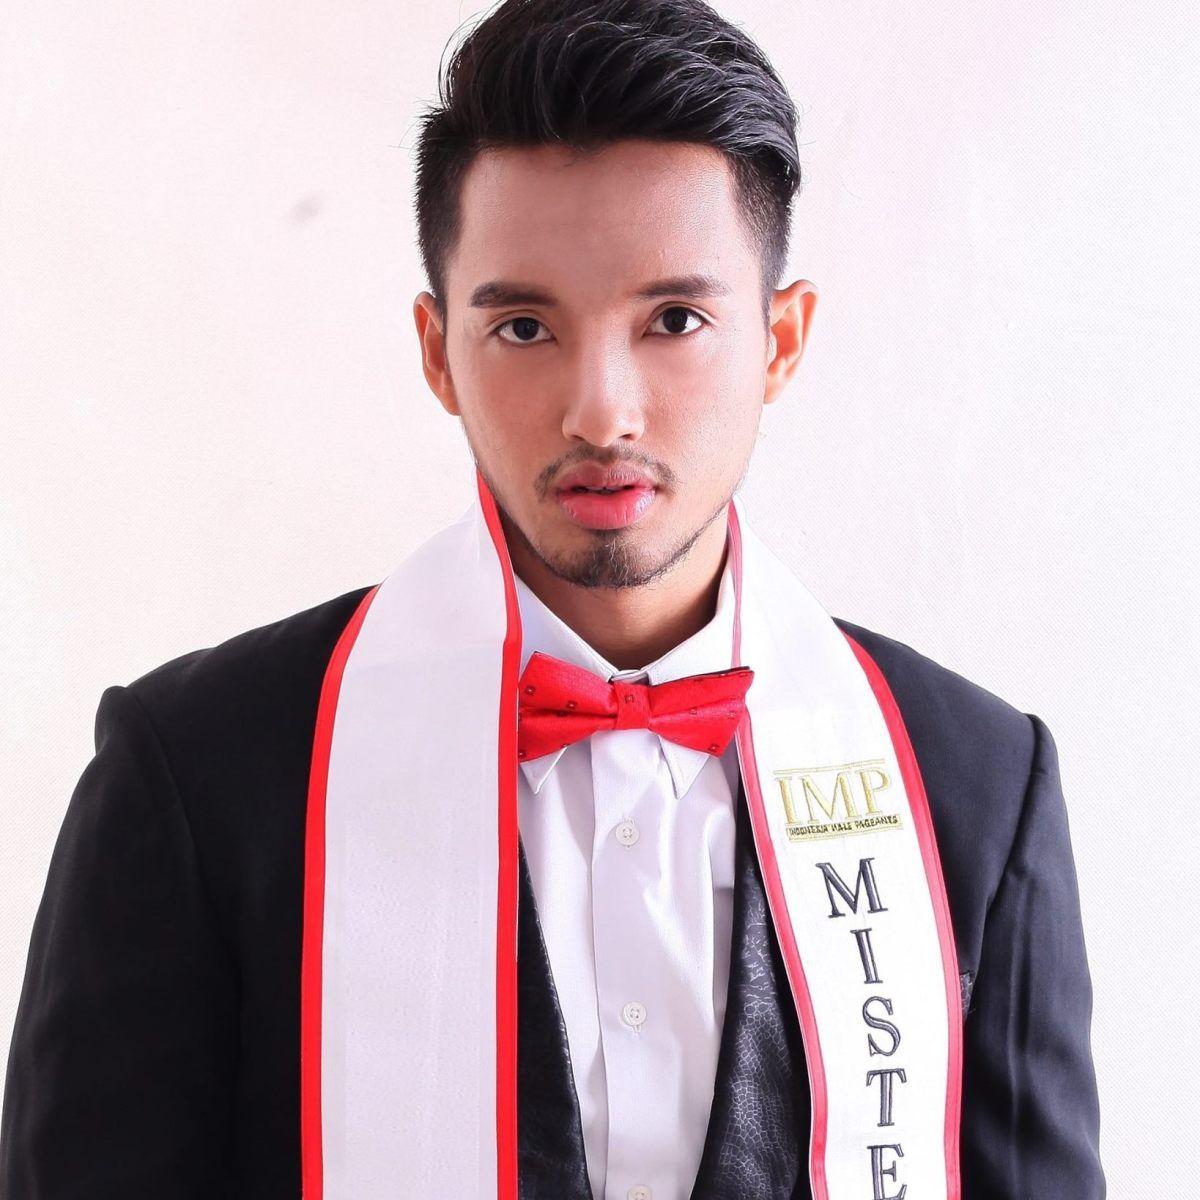 Gilbert Pangalila is Mister Supranational Indonesia 2017